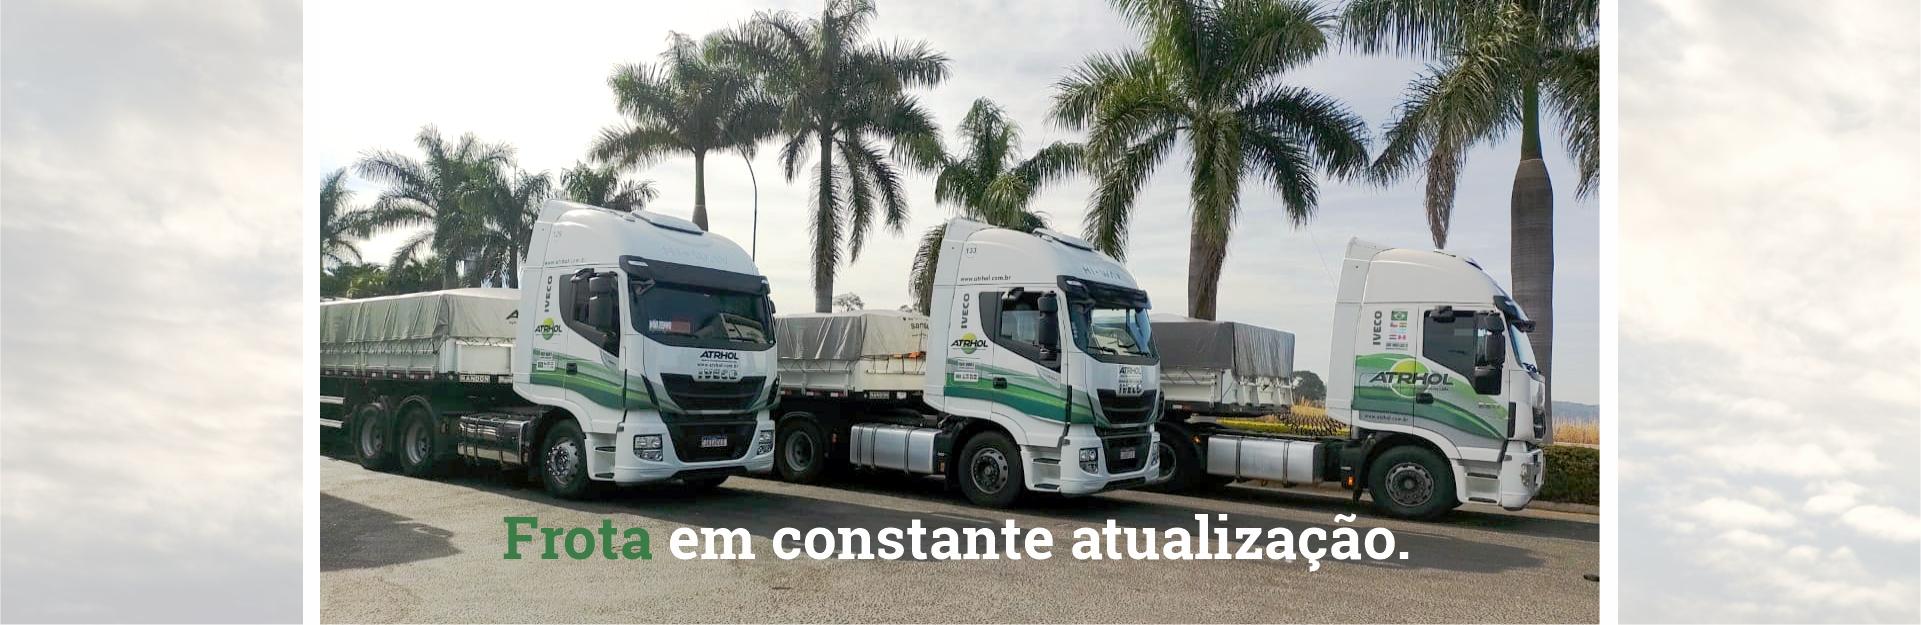 FROTA ATUALIZADA